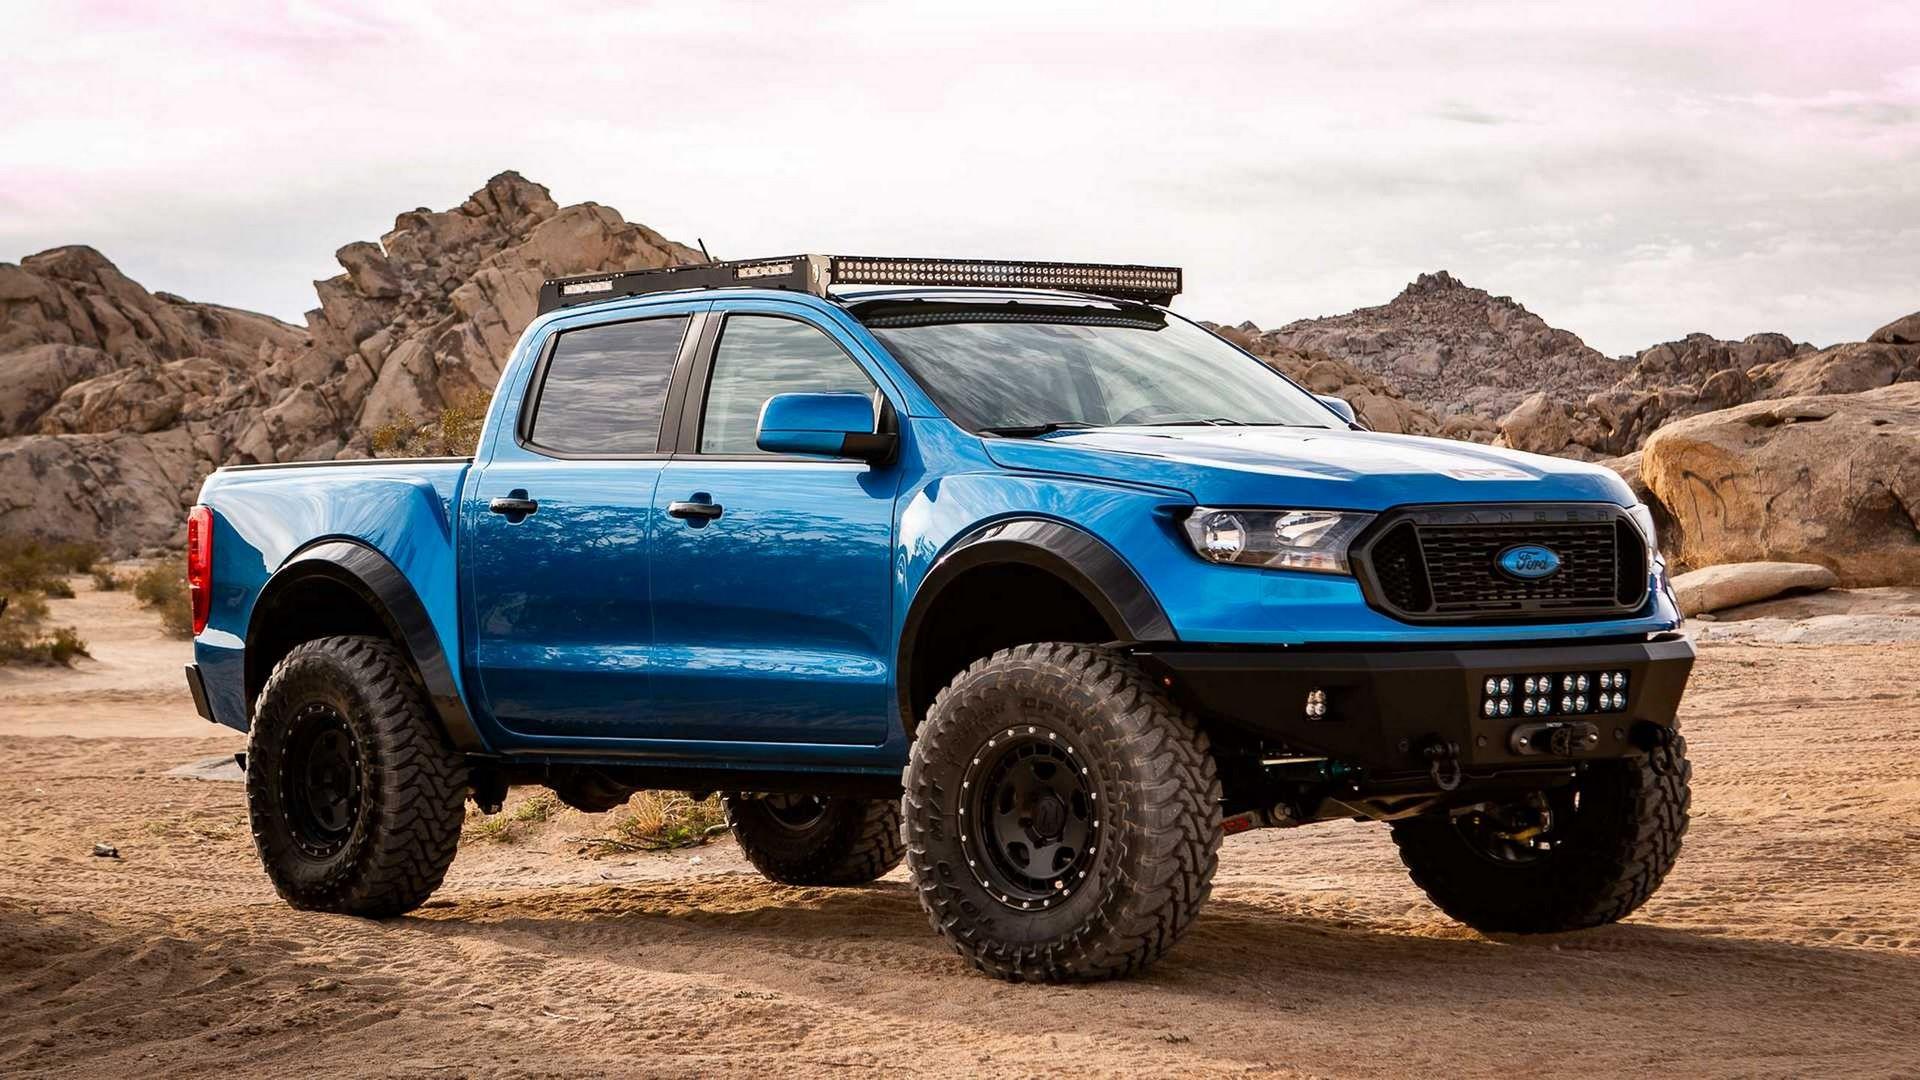 Ford-Ranger-Prorunner-By-APG-8